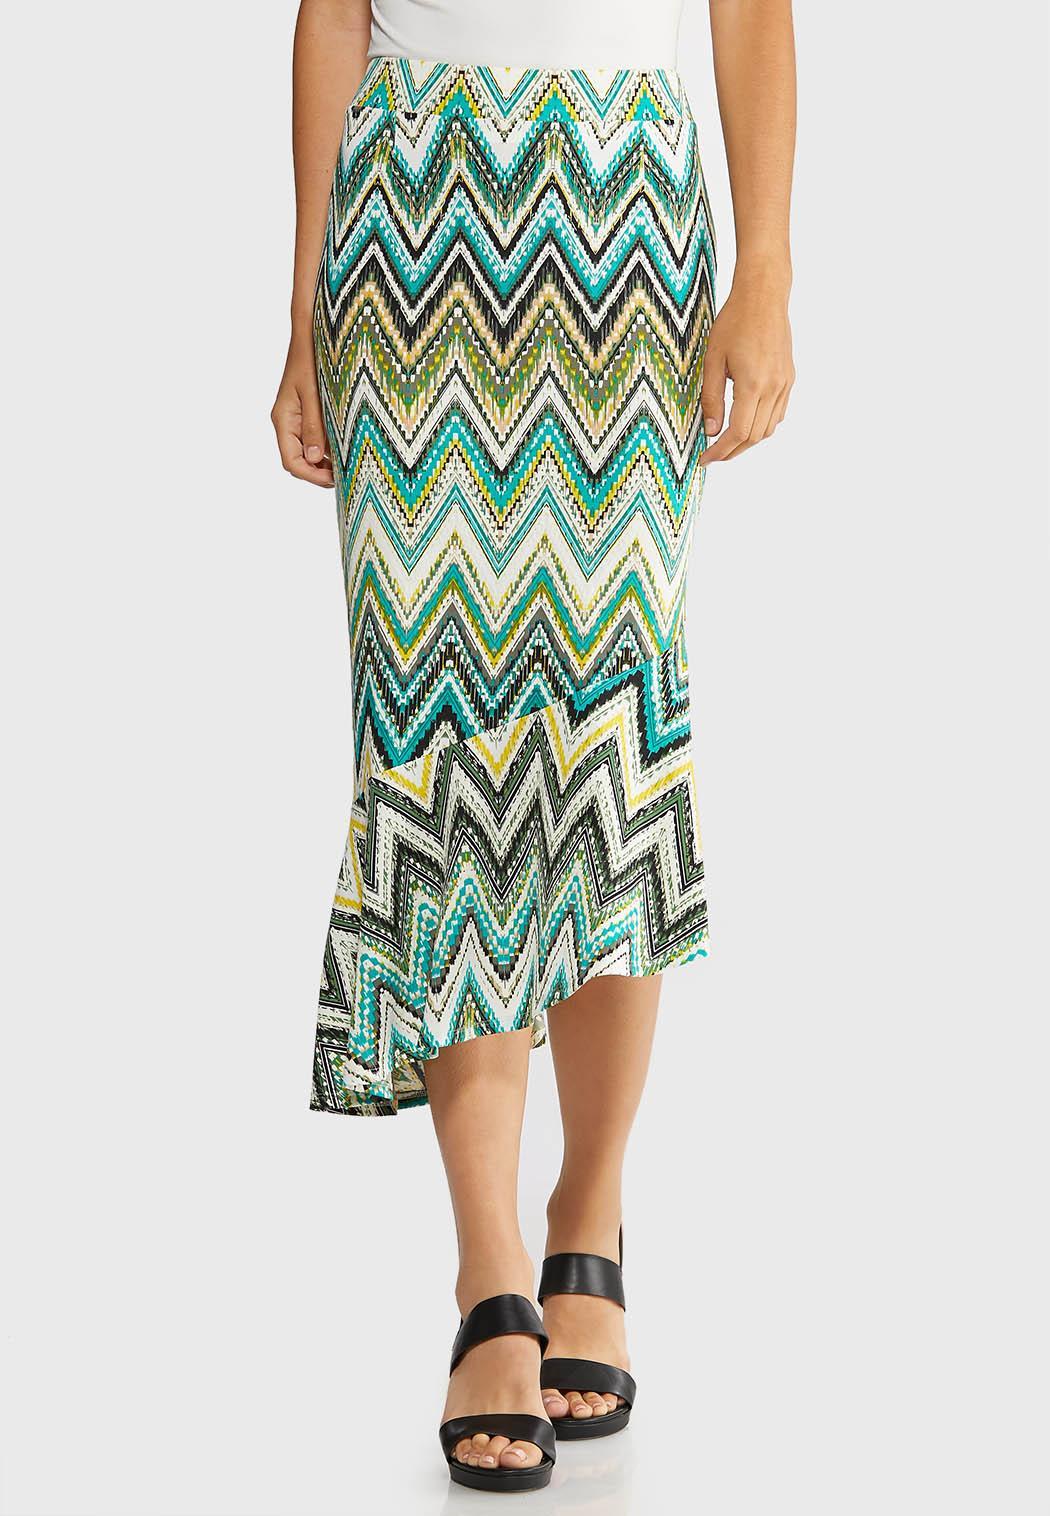 0b985bec8f20 Women's Plus Size Skirts